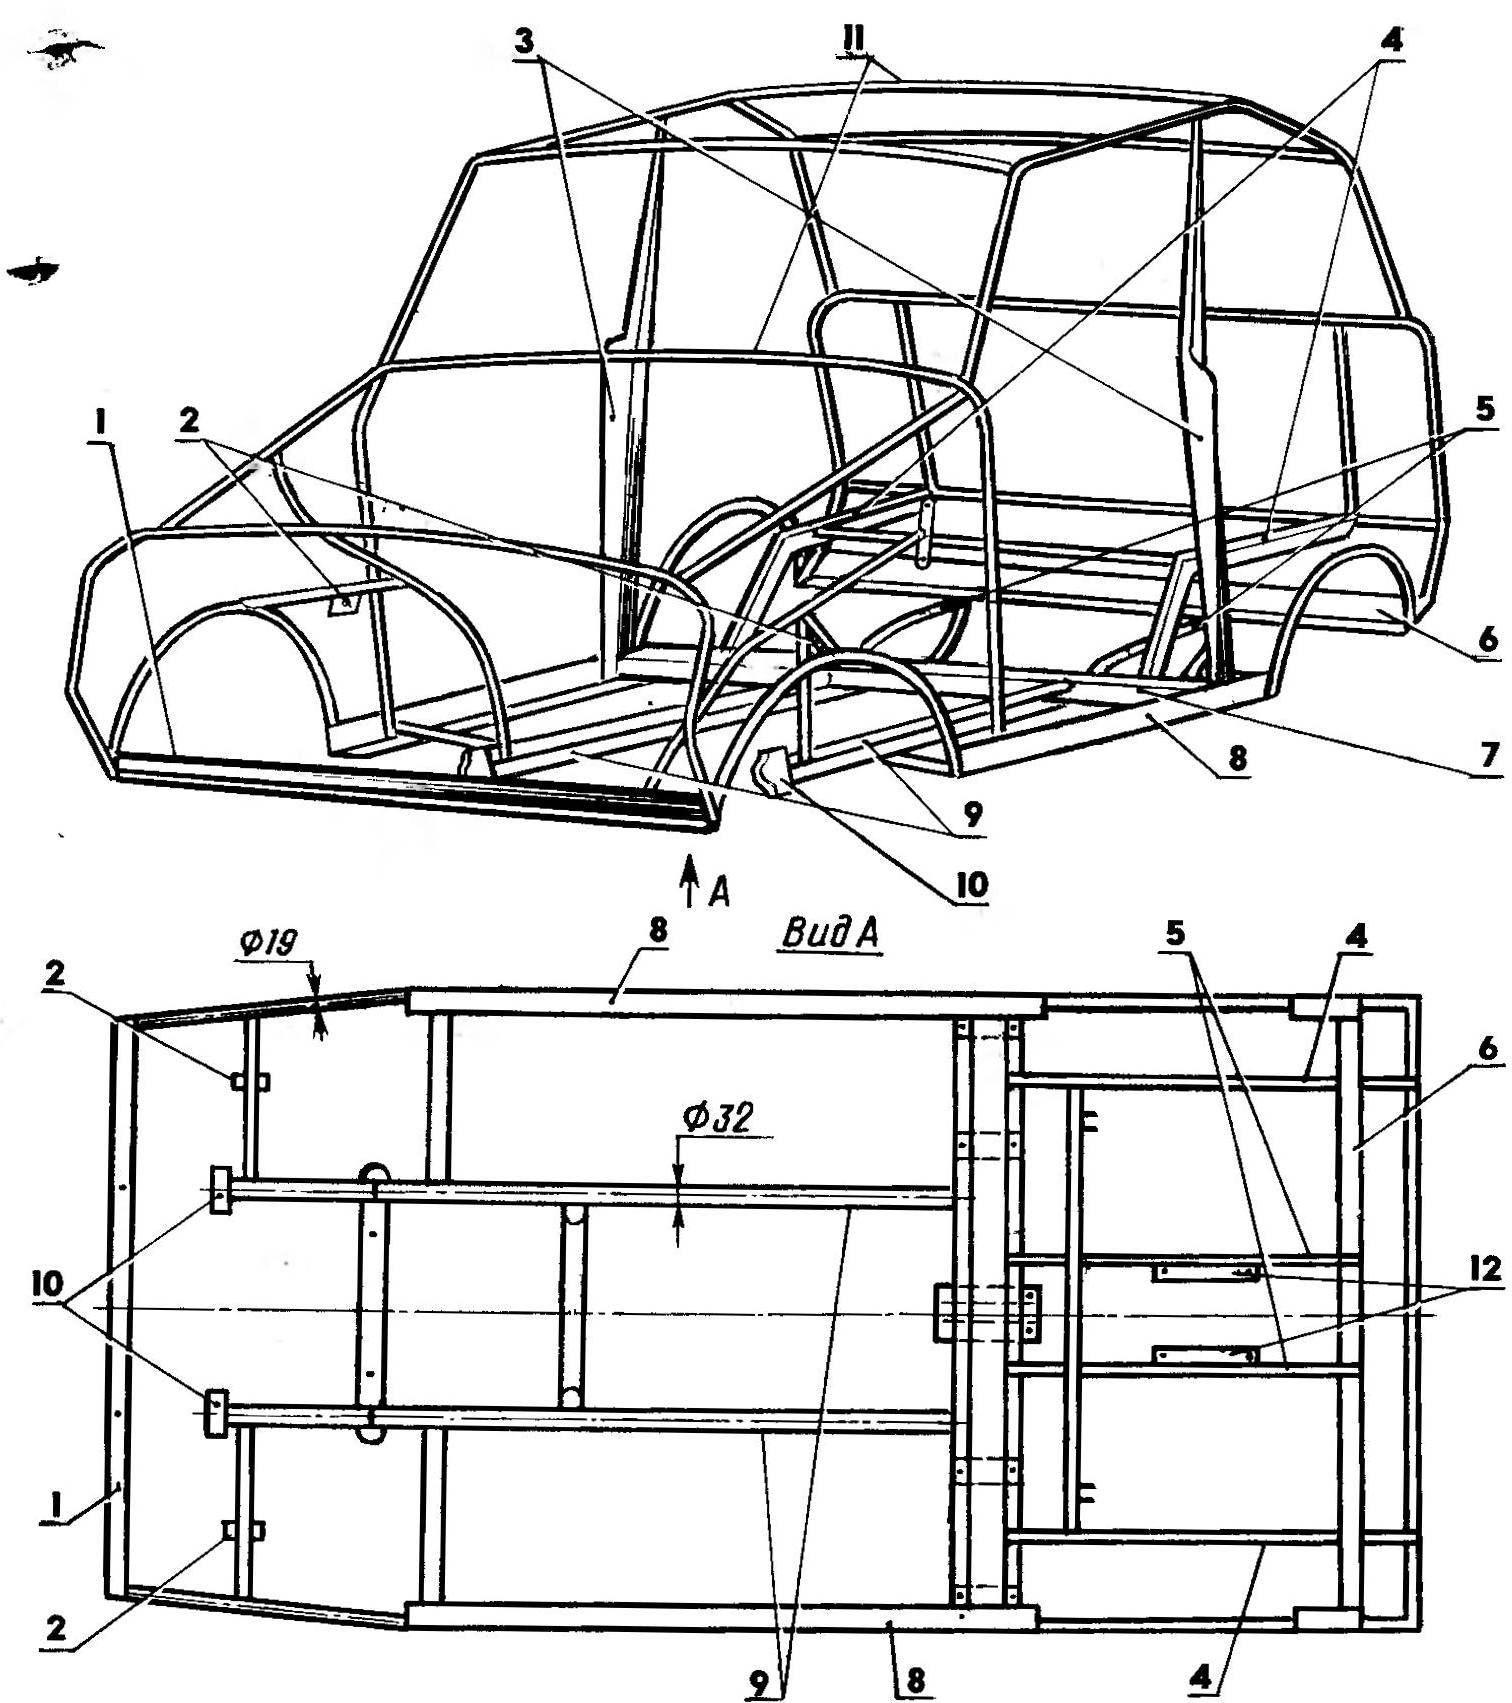 Fig. 2. Tubular frame